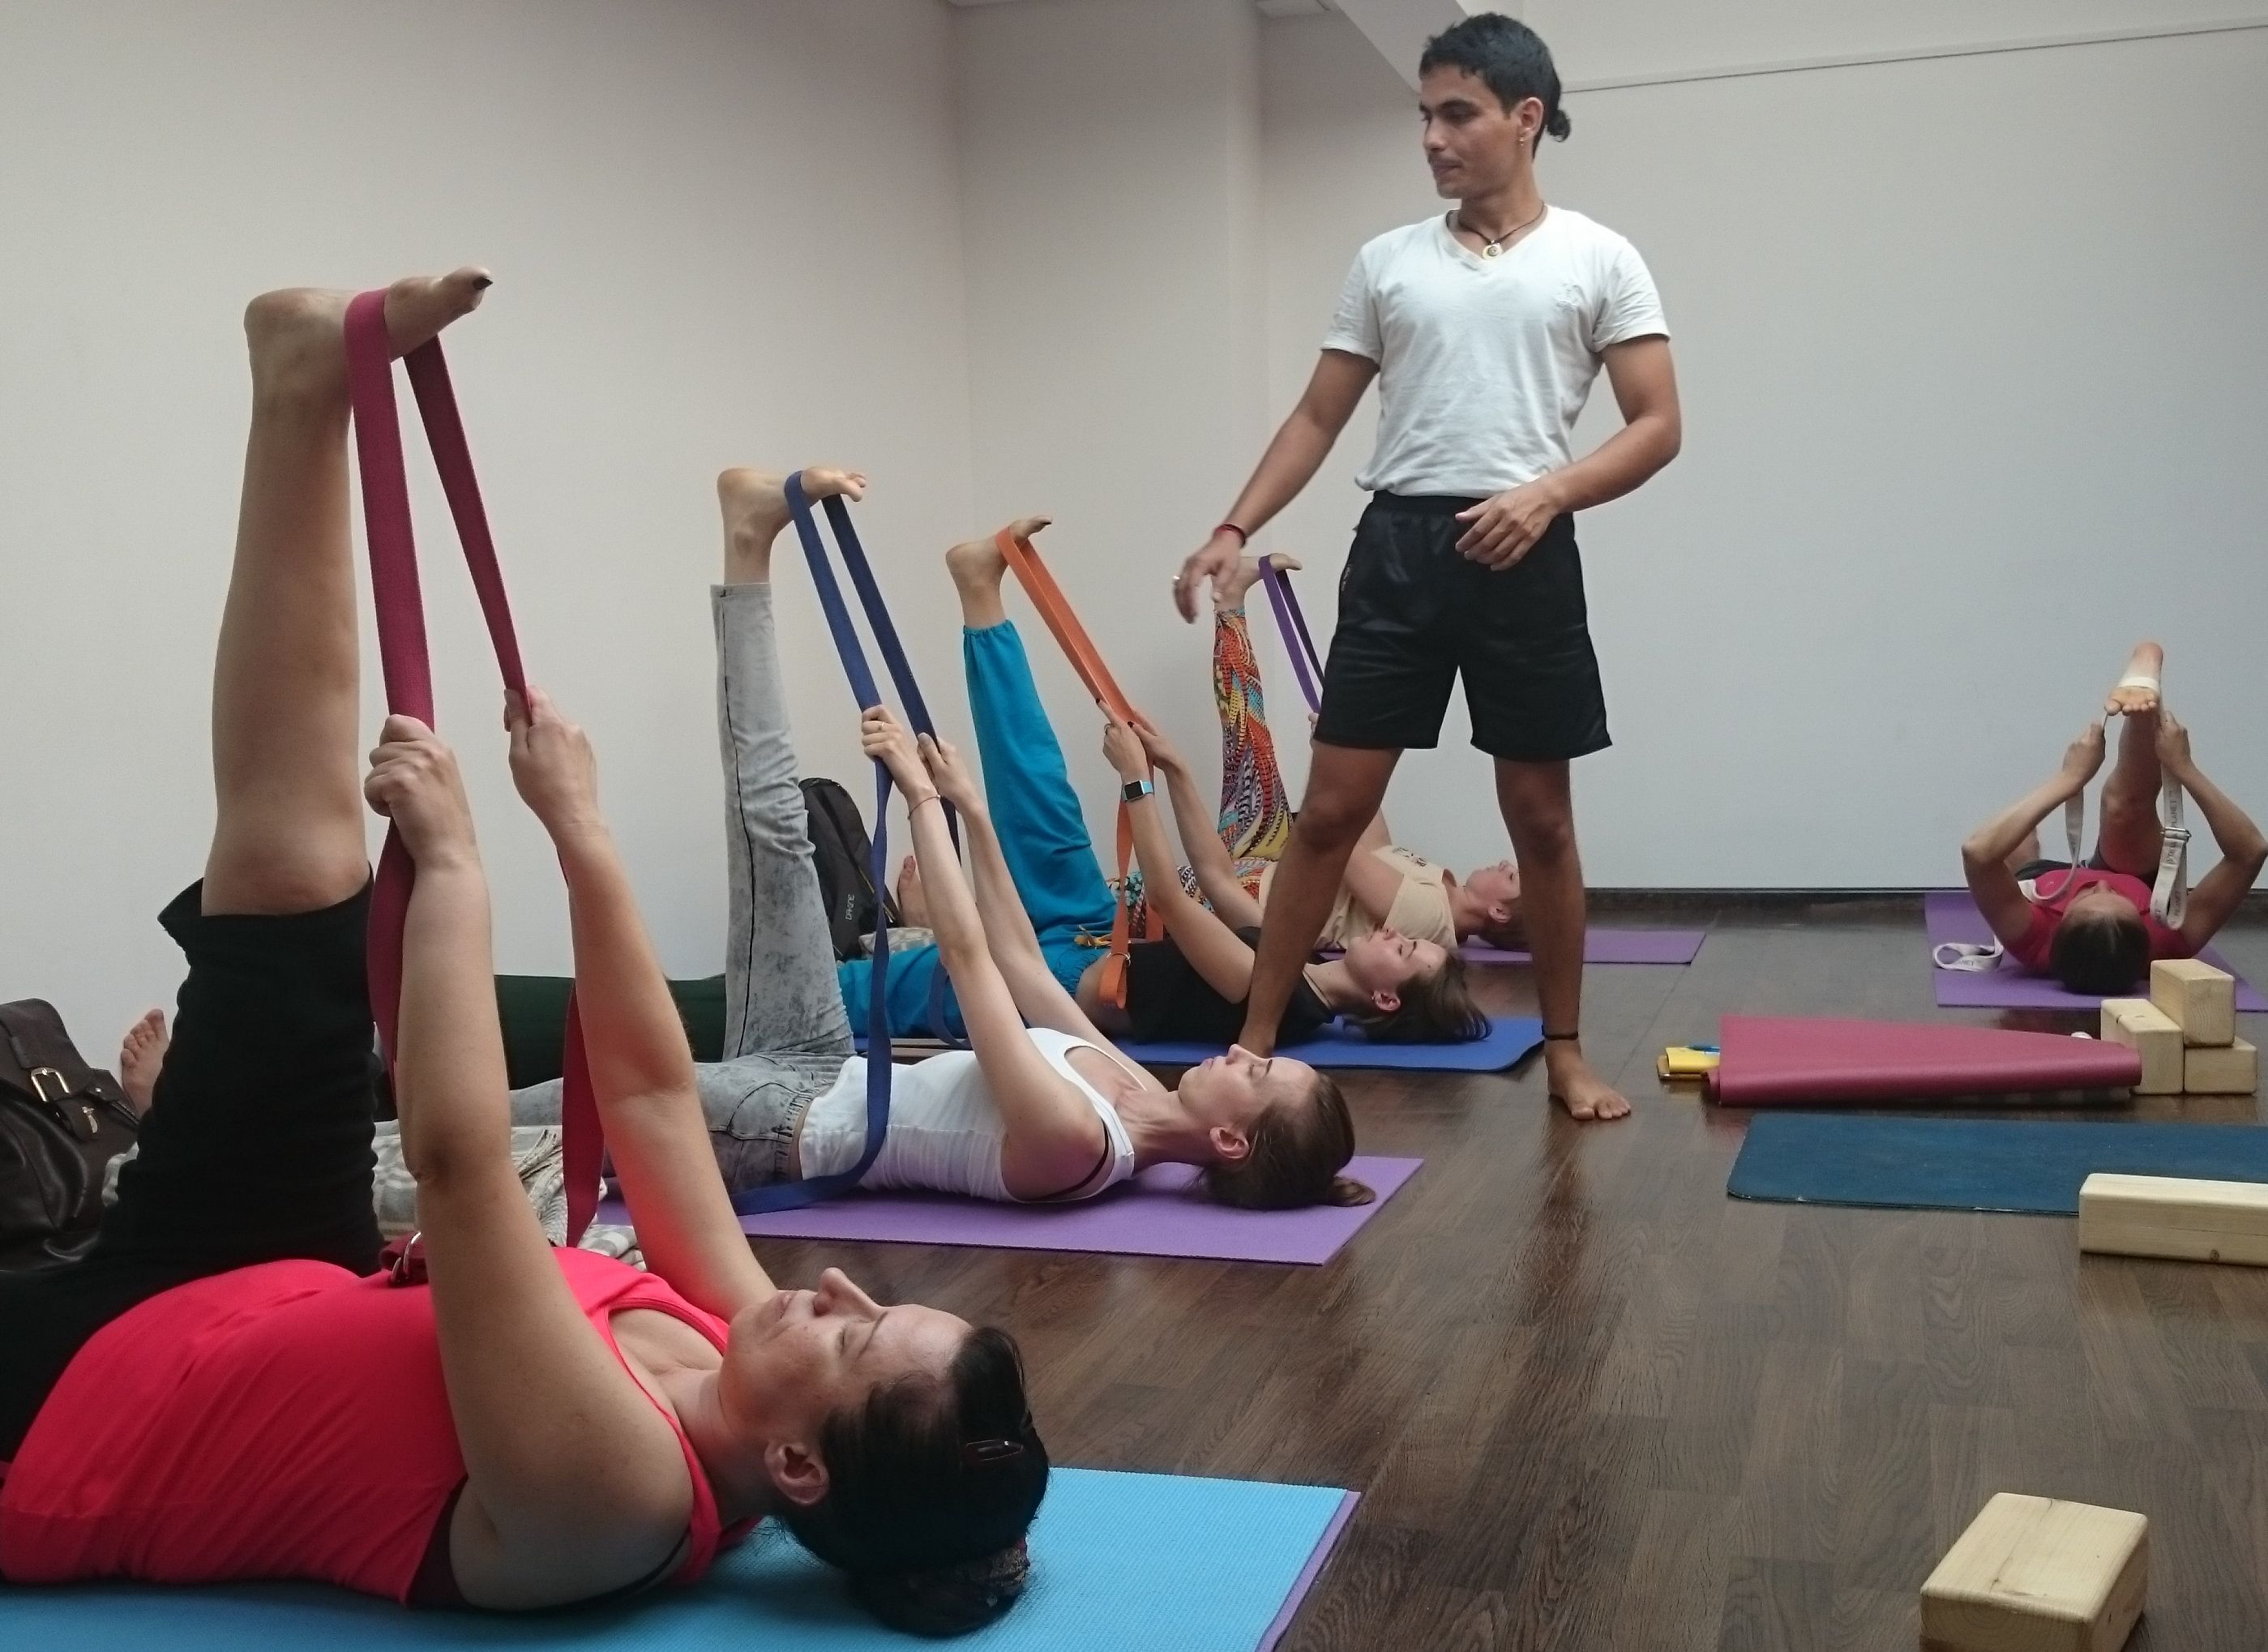 Join 200_hour_yoga_teacher_training_in_rishikesh india